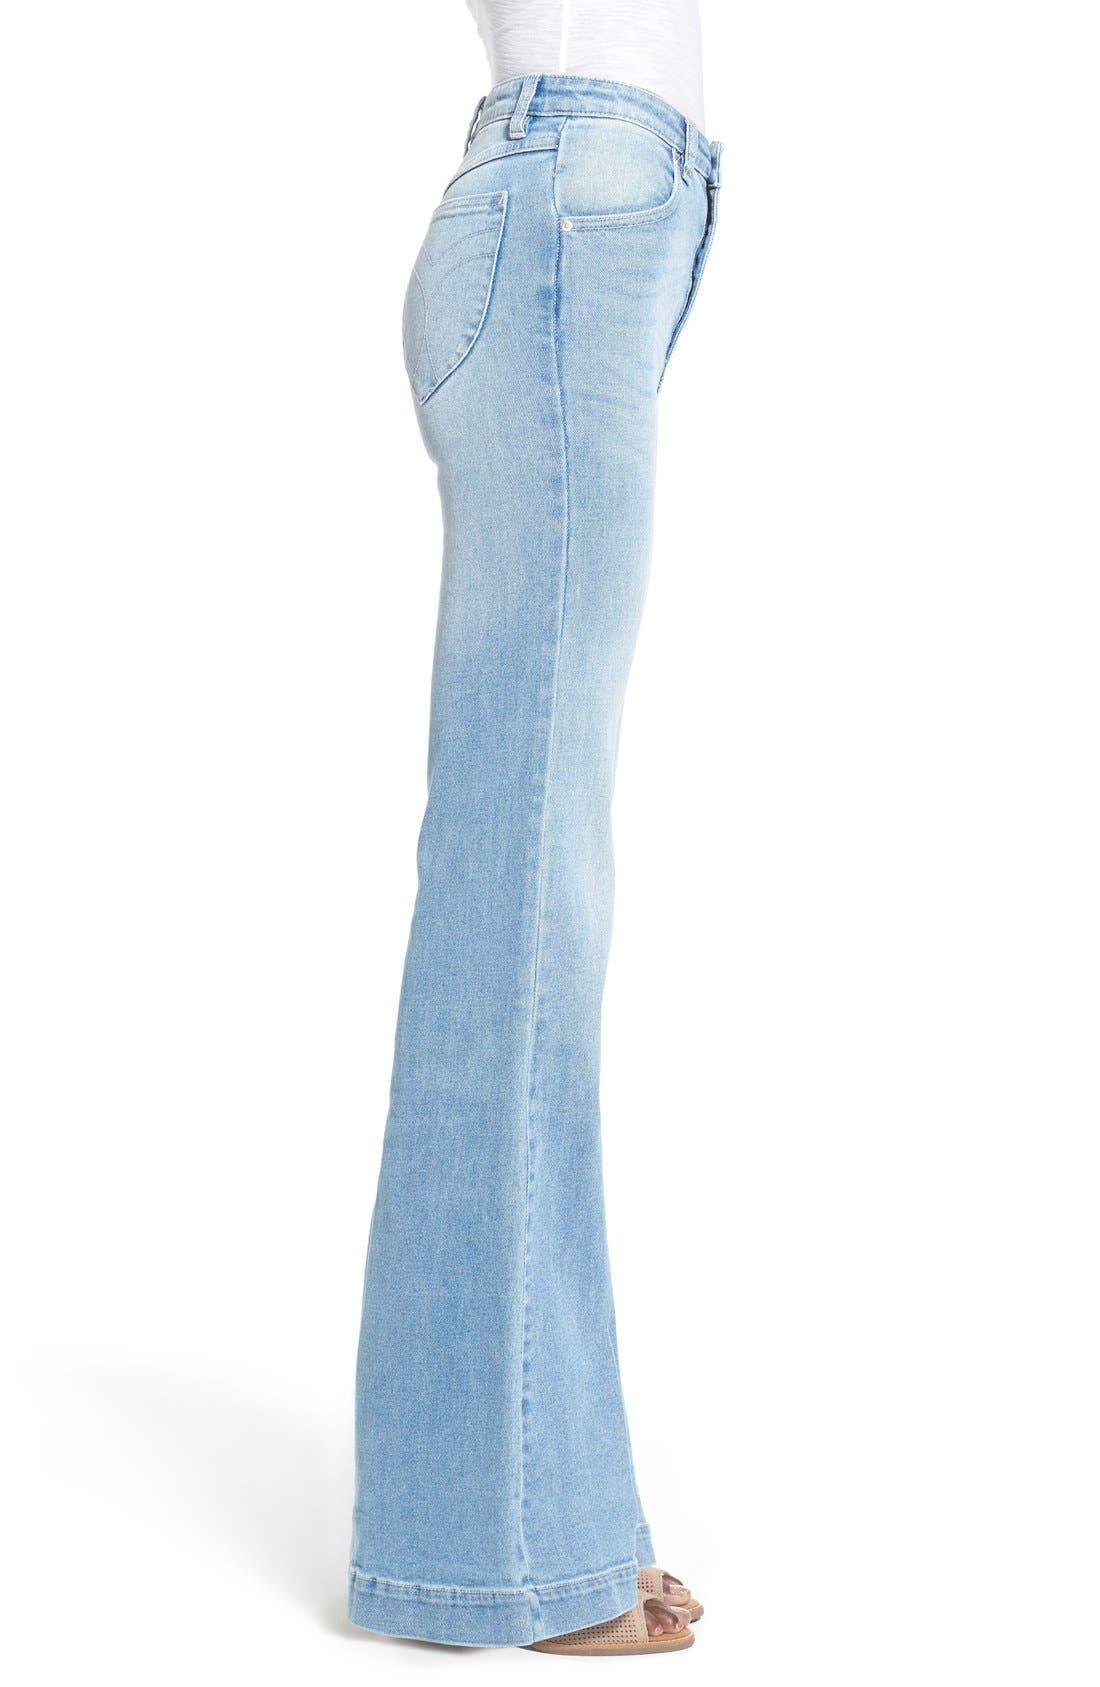 ROLLA'S,                             'East Coast' Flare Jeans,                             Alternate thumbnail 5, color,                             430